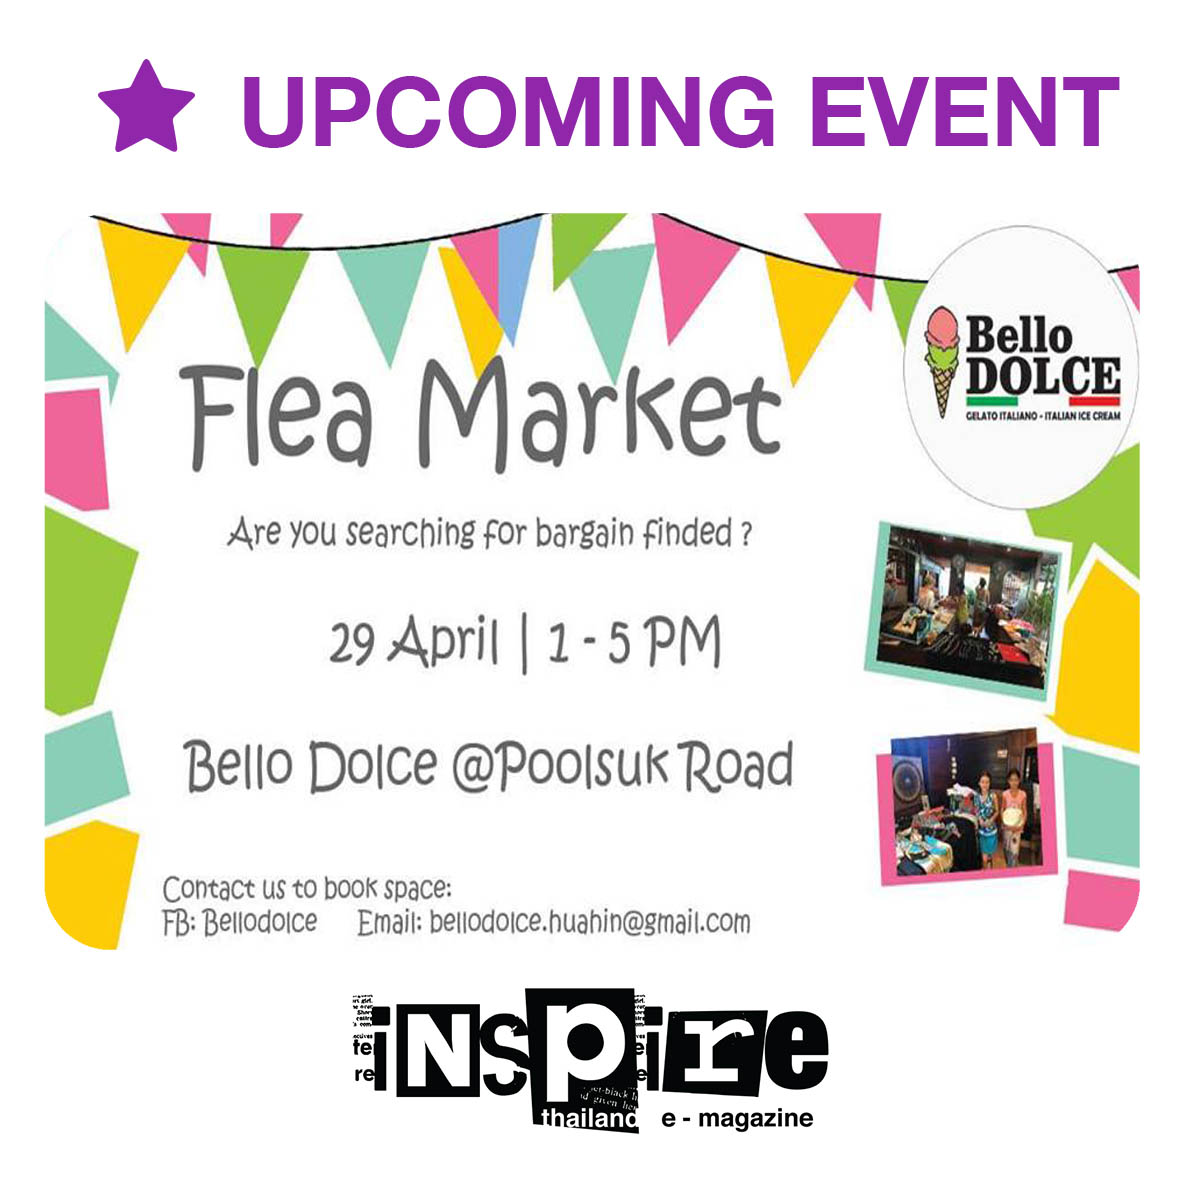 Flea Market at Bello Dolce – Sunday 29th April 2018